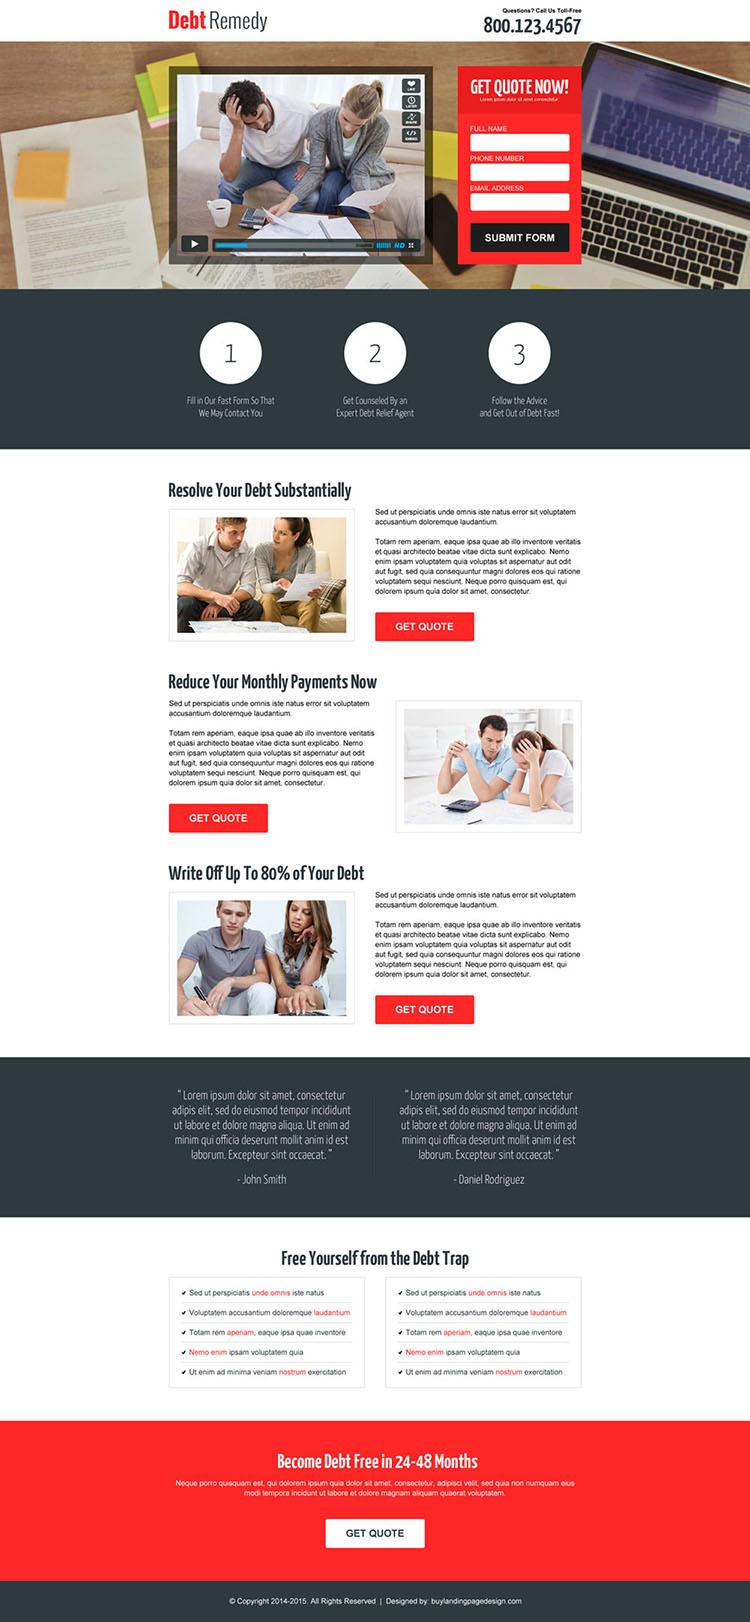 debt relief business converting responsive lead capture landing page design